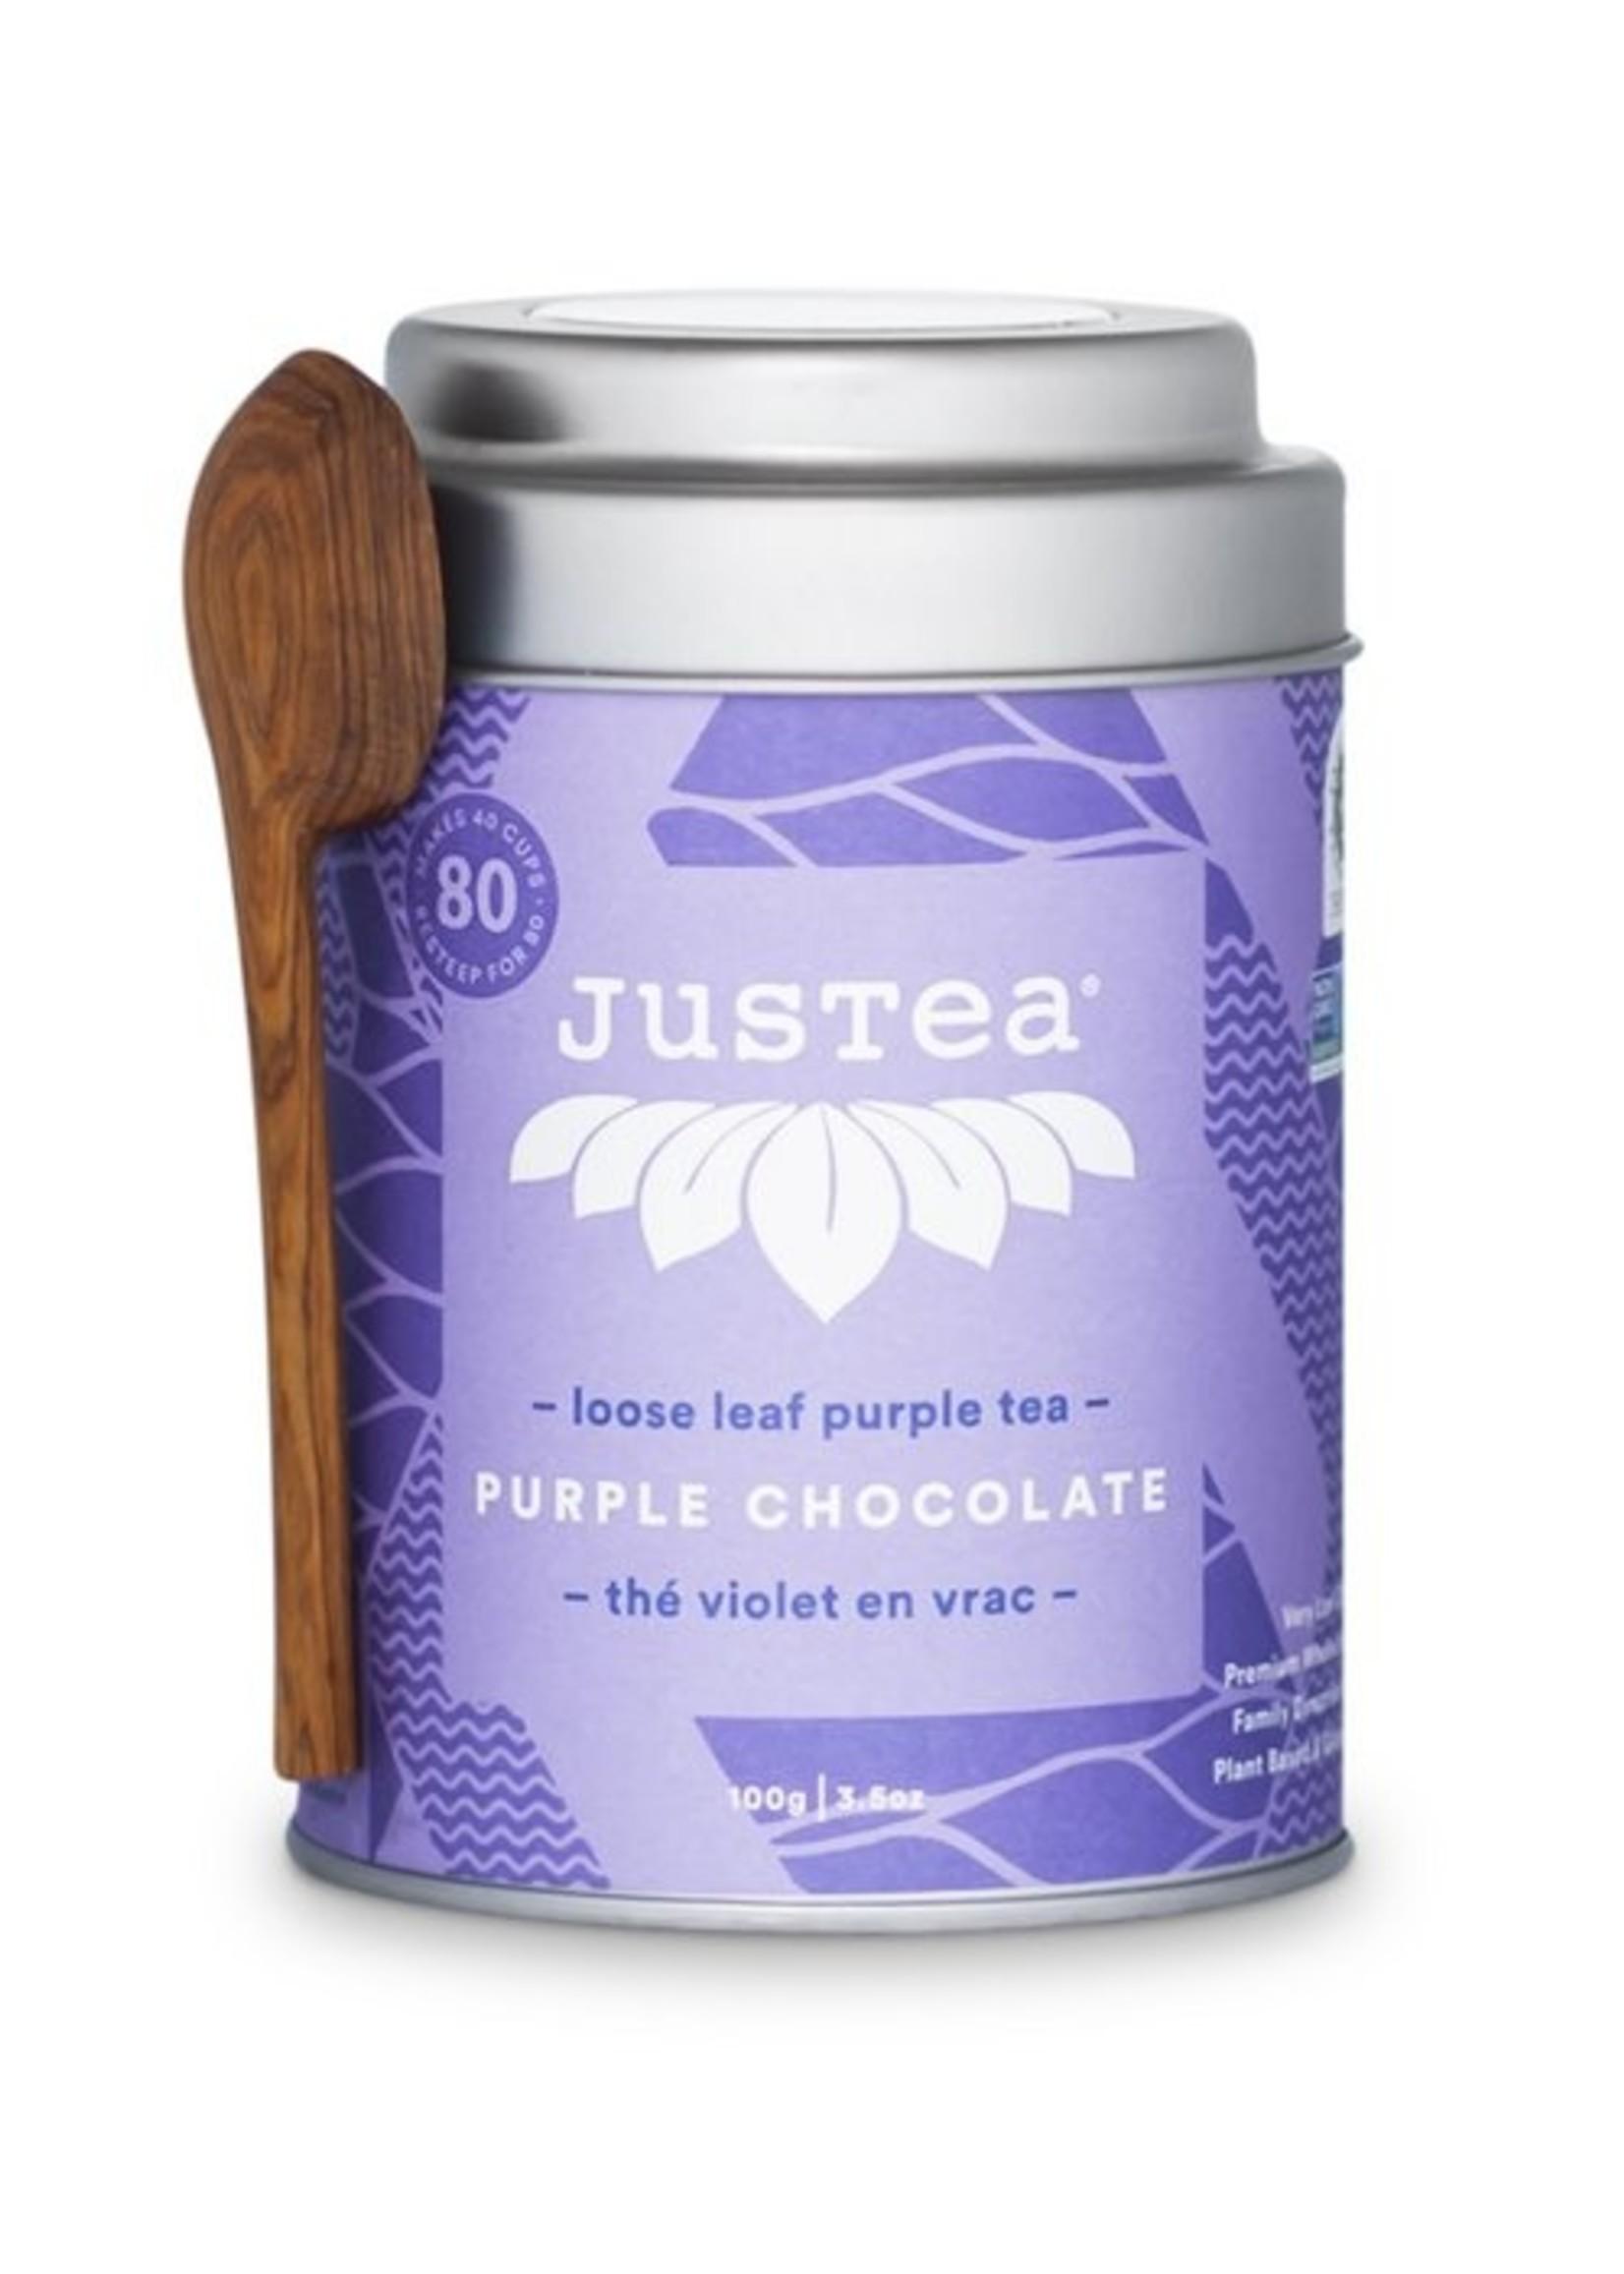 Justea Justea - pure Chocolate